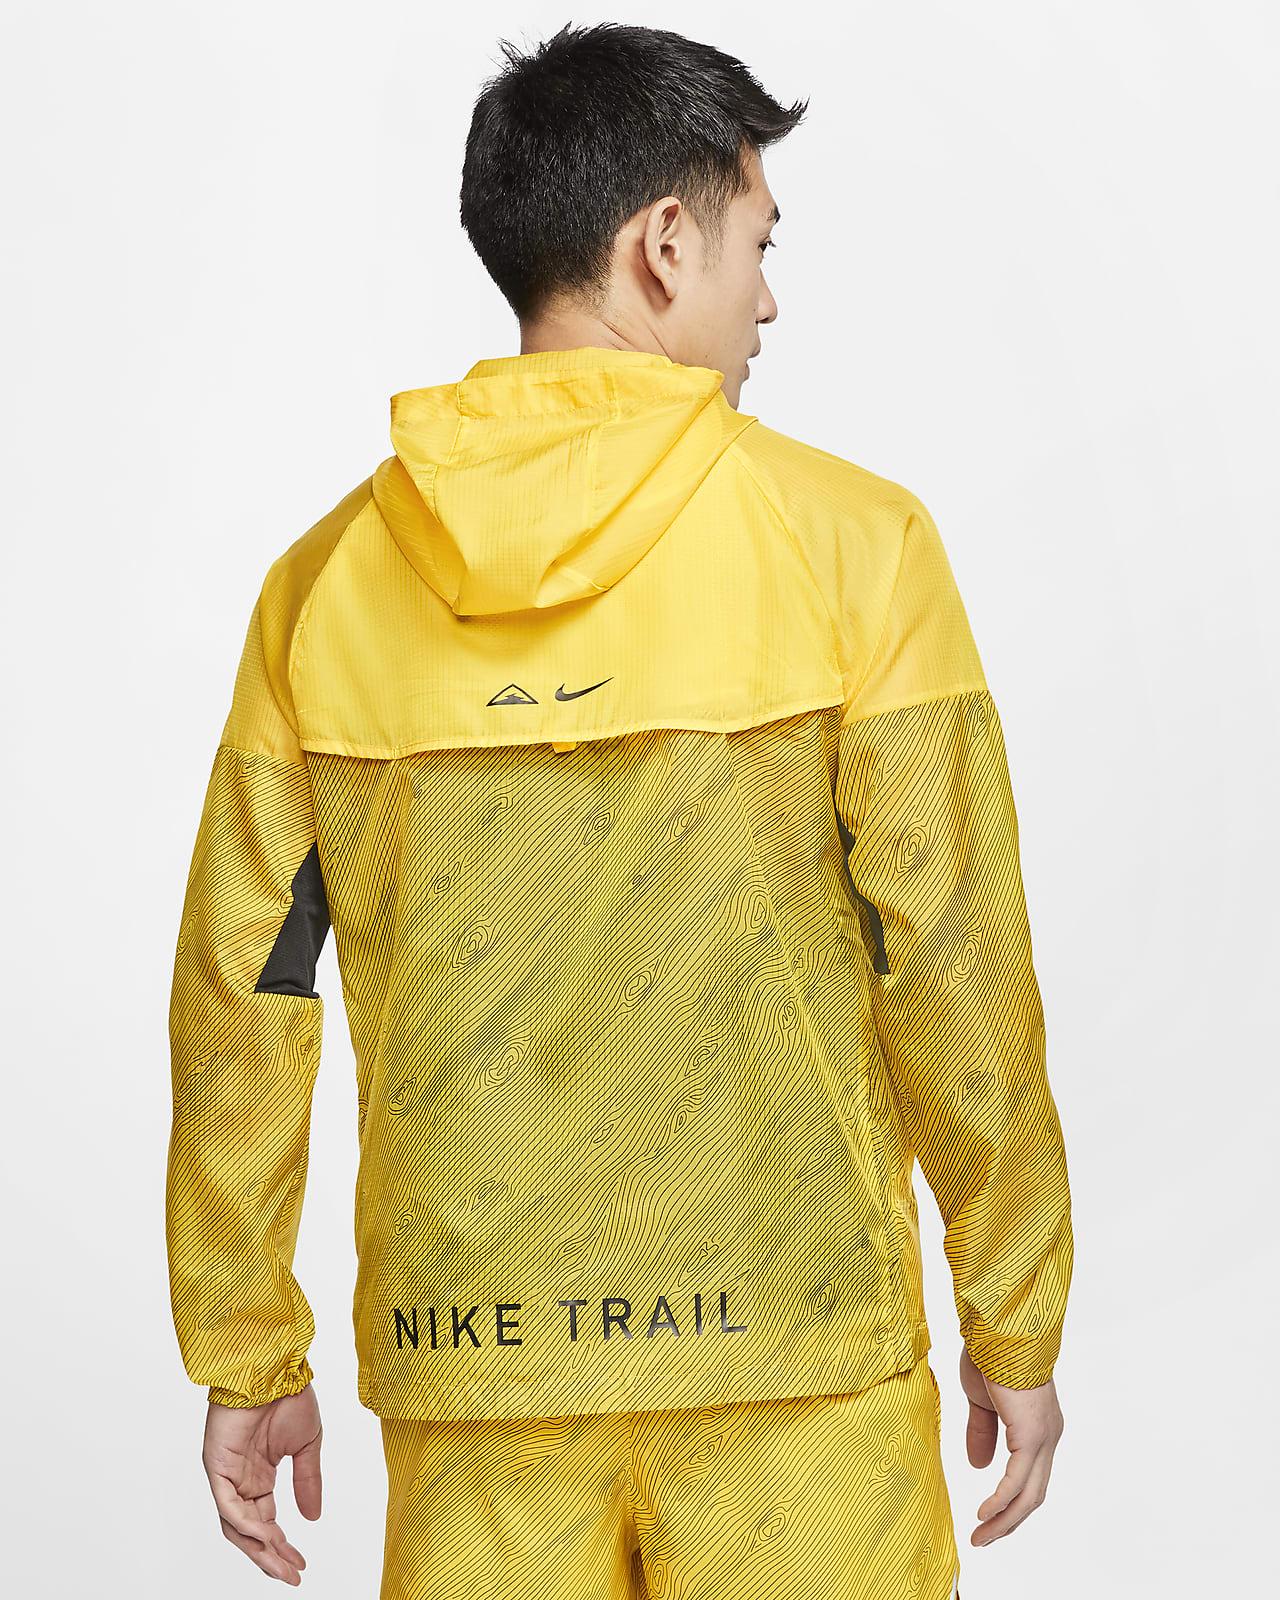 cáustico arroz Dislocación  Nike Windrunner Men's Hooded Trail Running Jacket. Nike MY